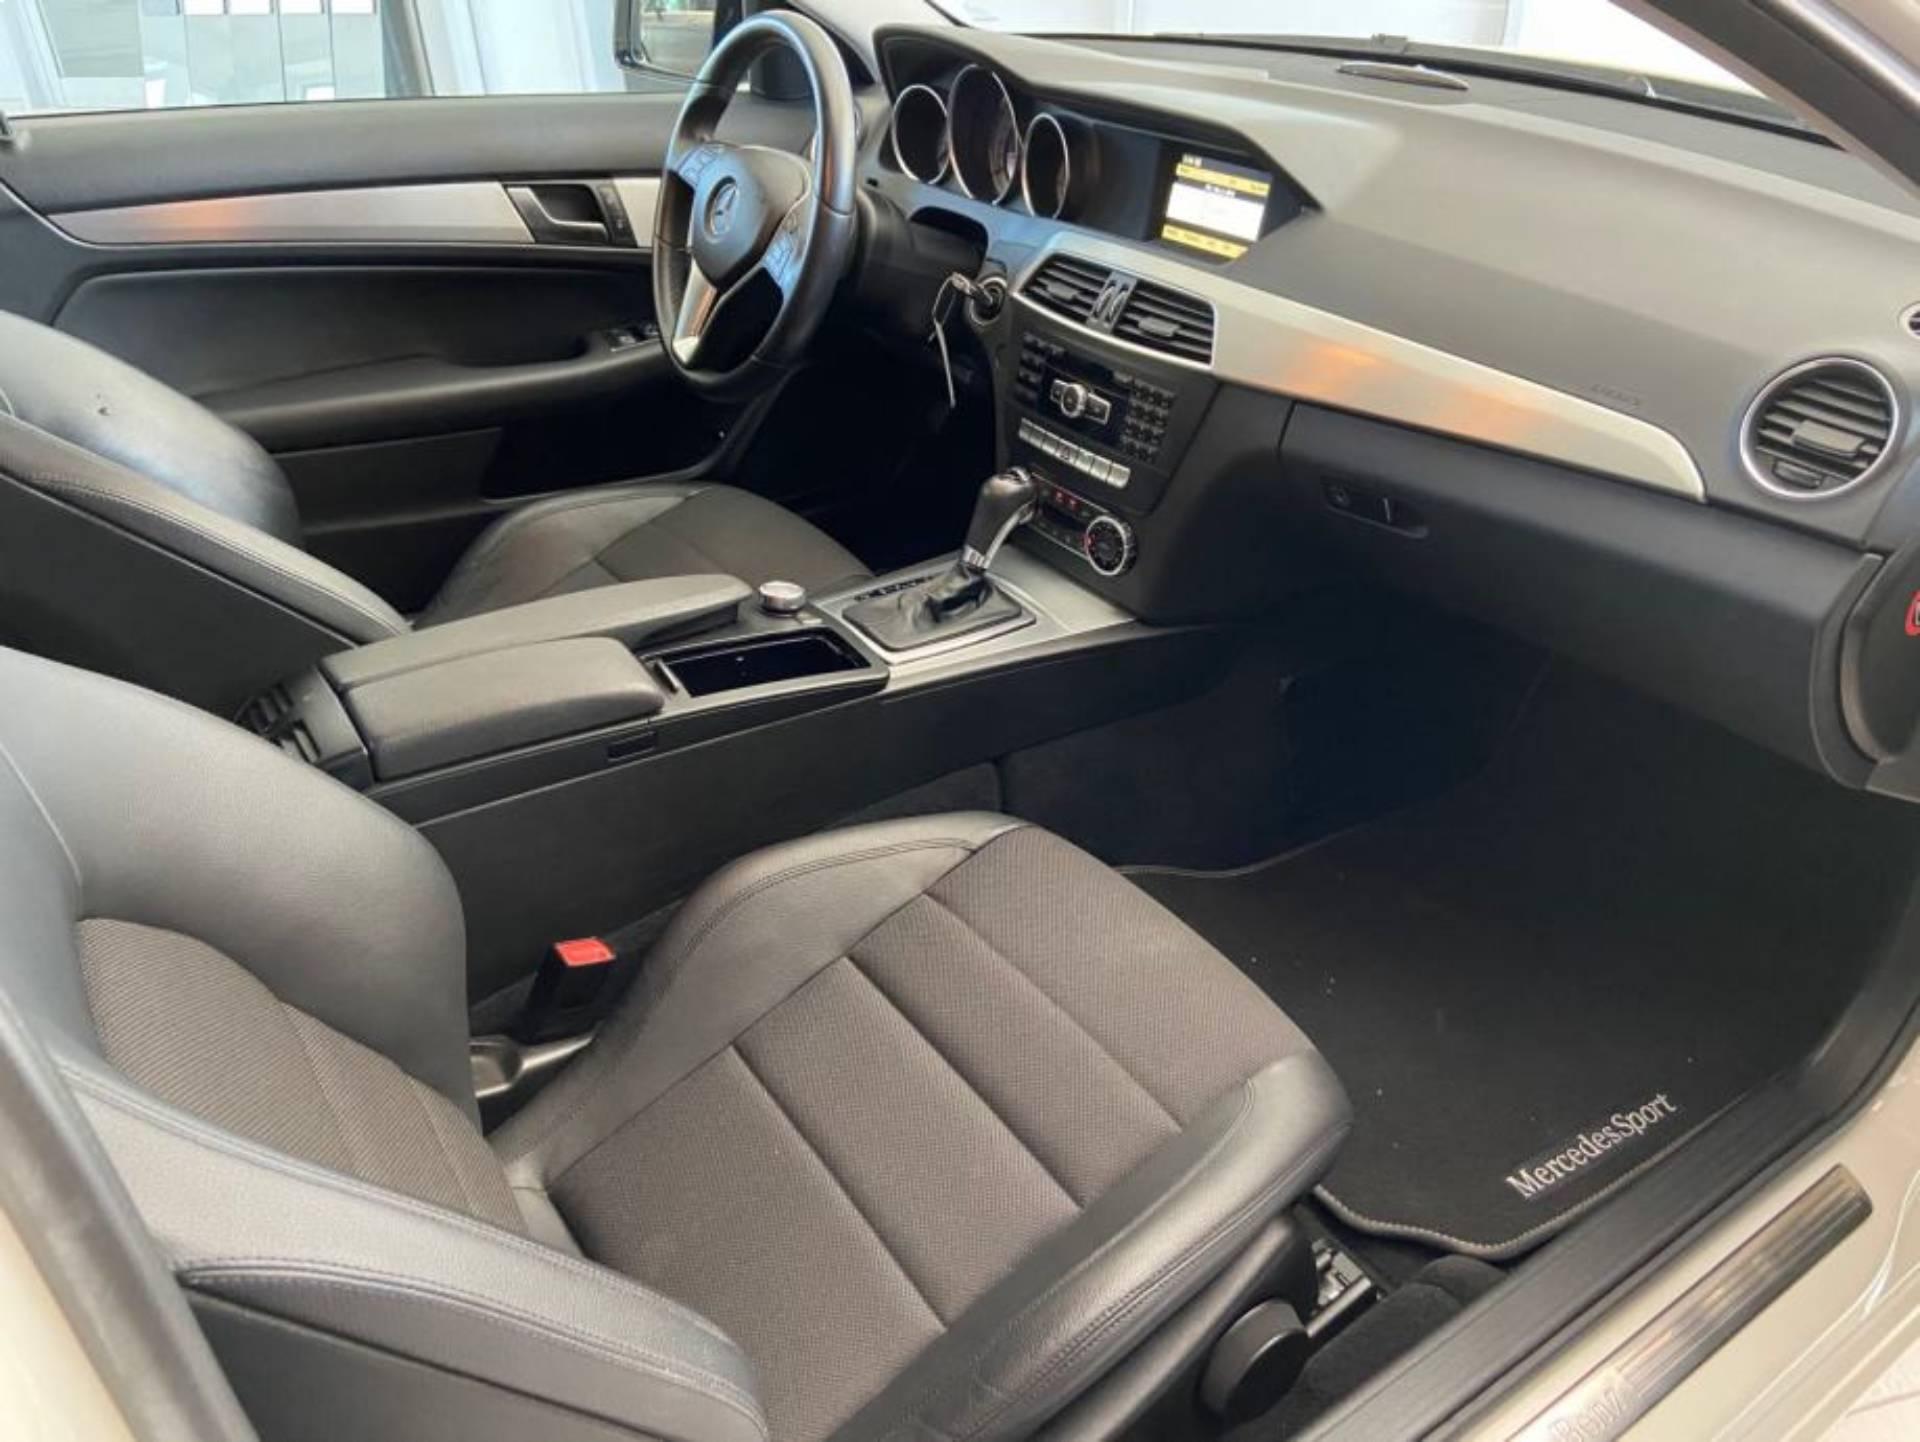 Mercedes Benz C 220 CDI COUPE AVANTGARDE